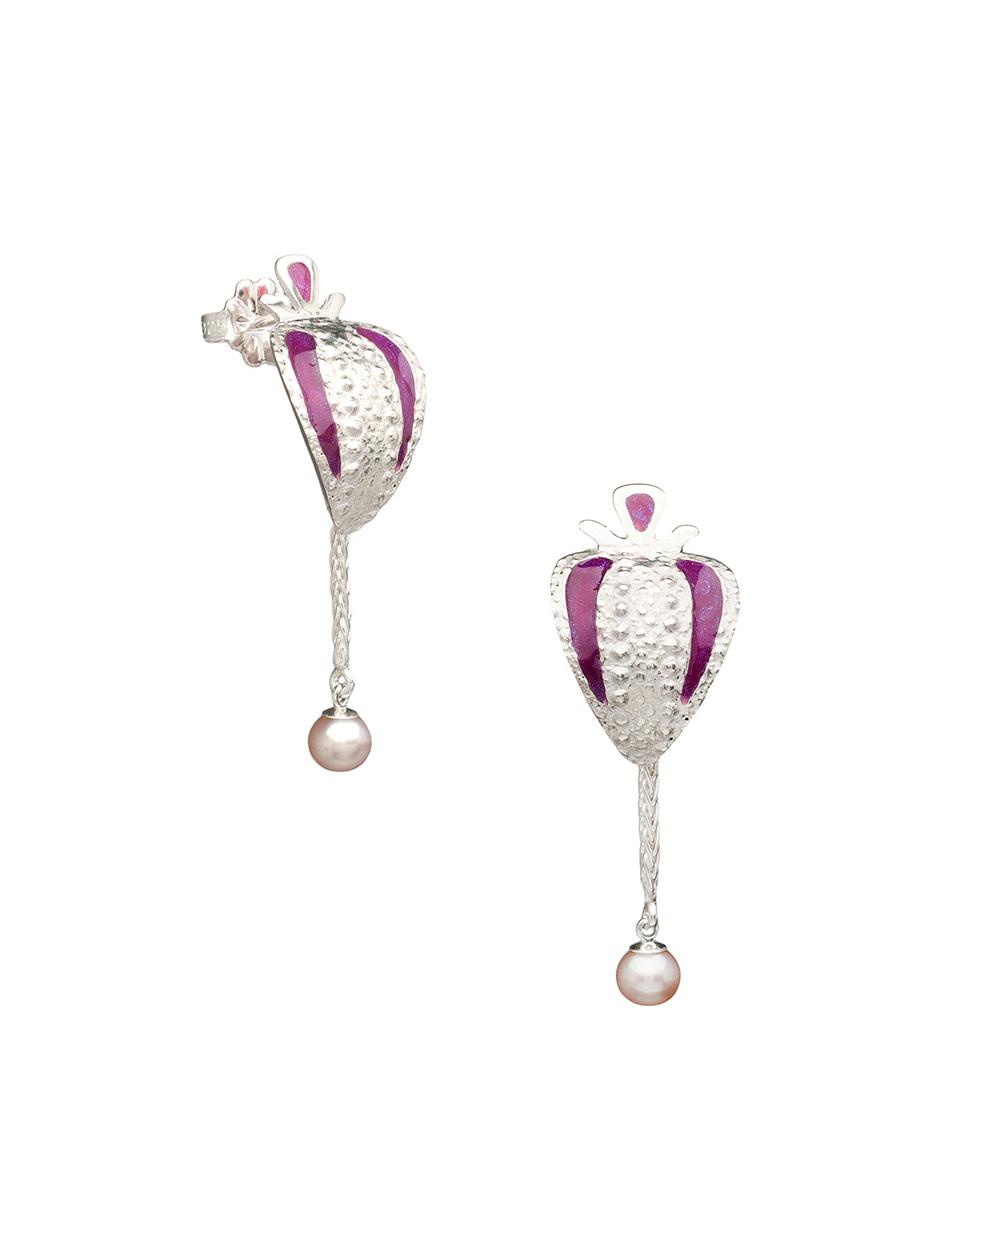 2015-10-Mary-Lynn-Podiluk-Argot-Earrings-P102a.jpg